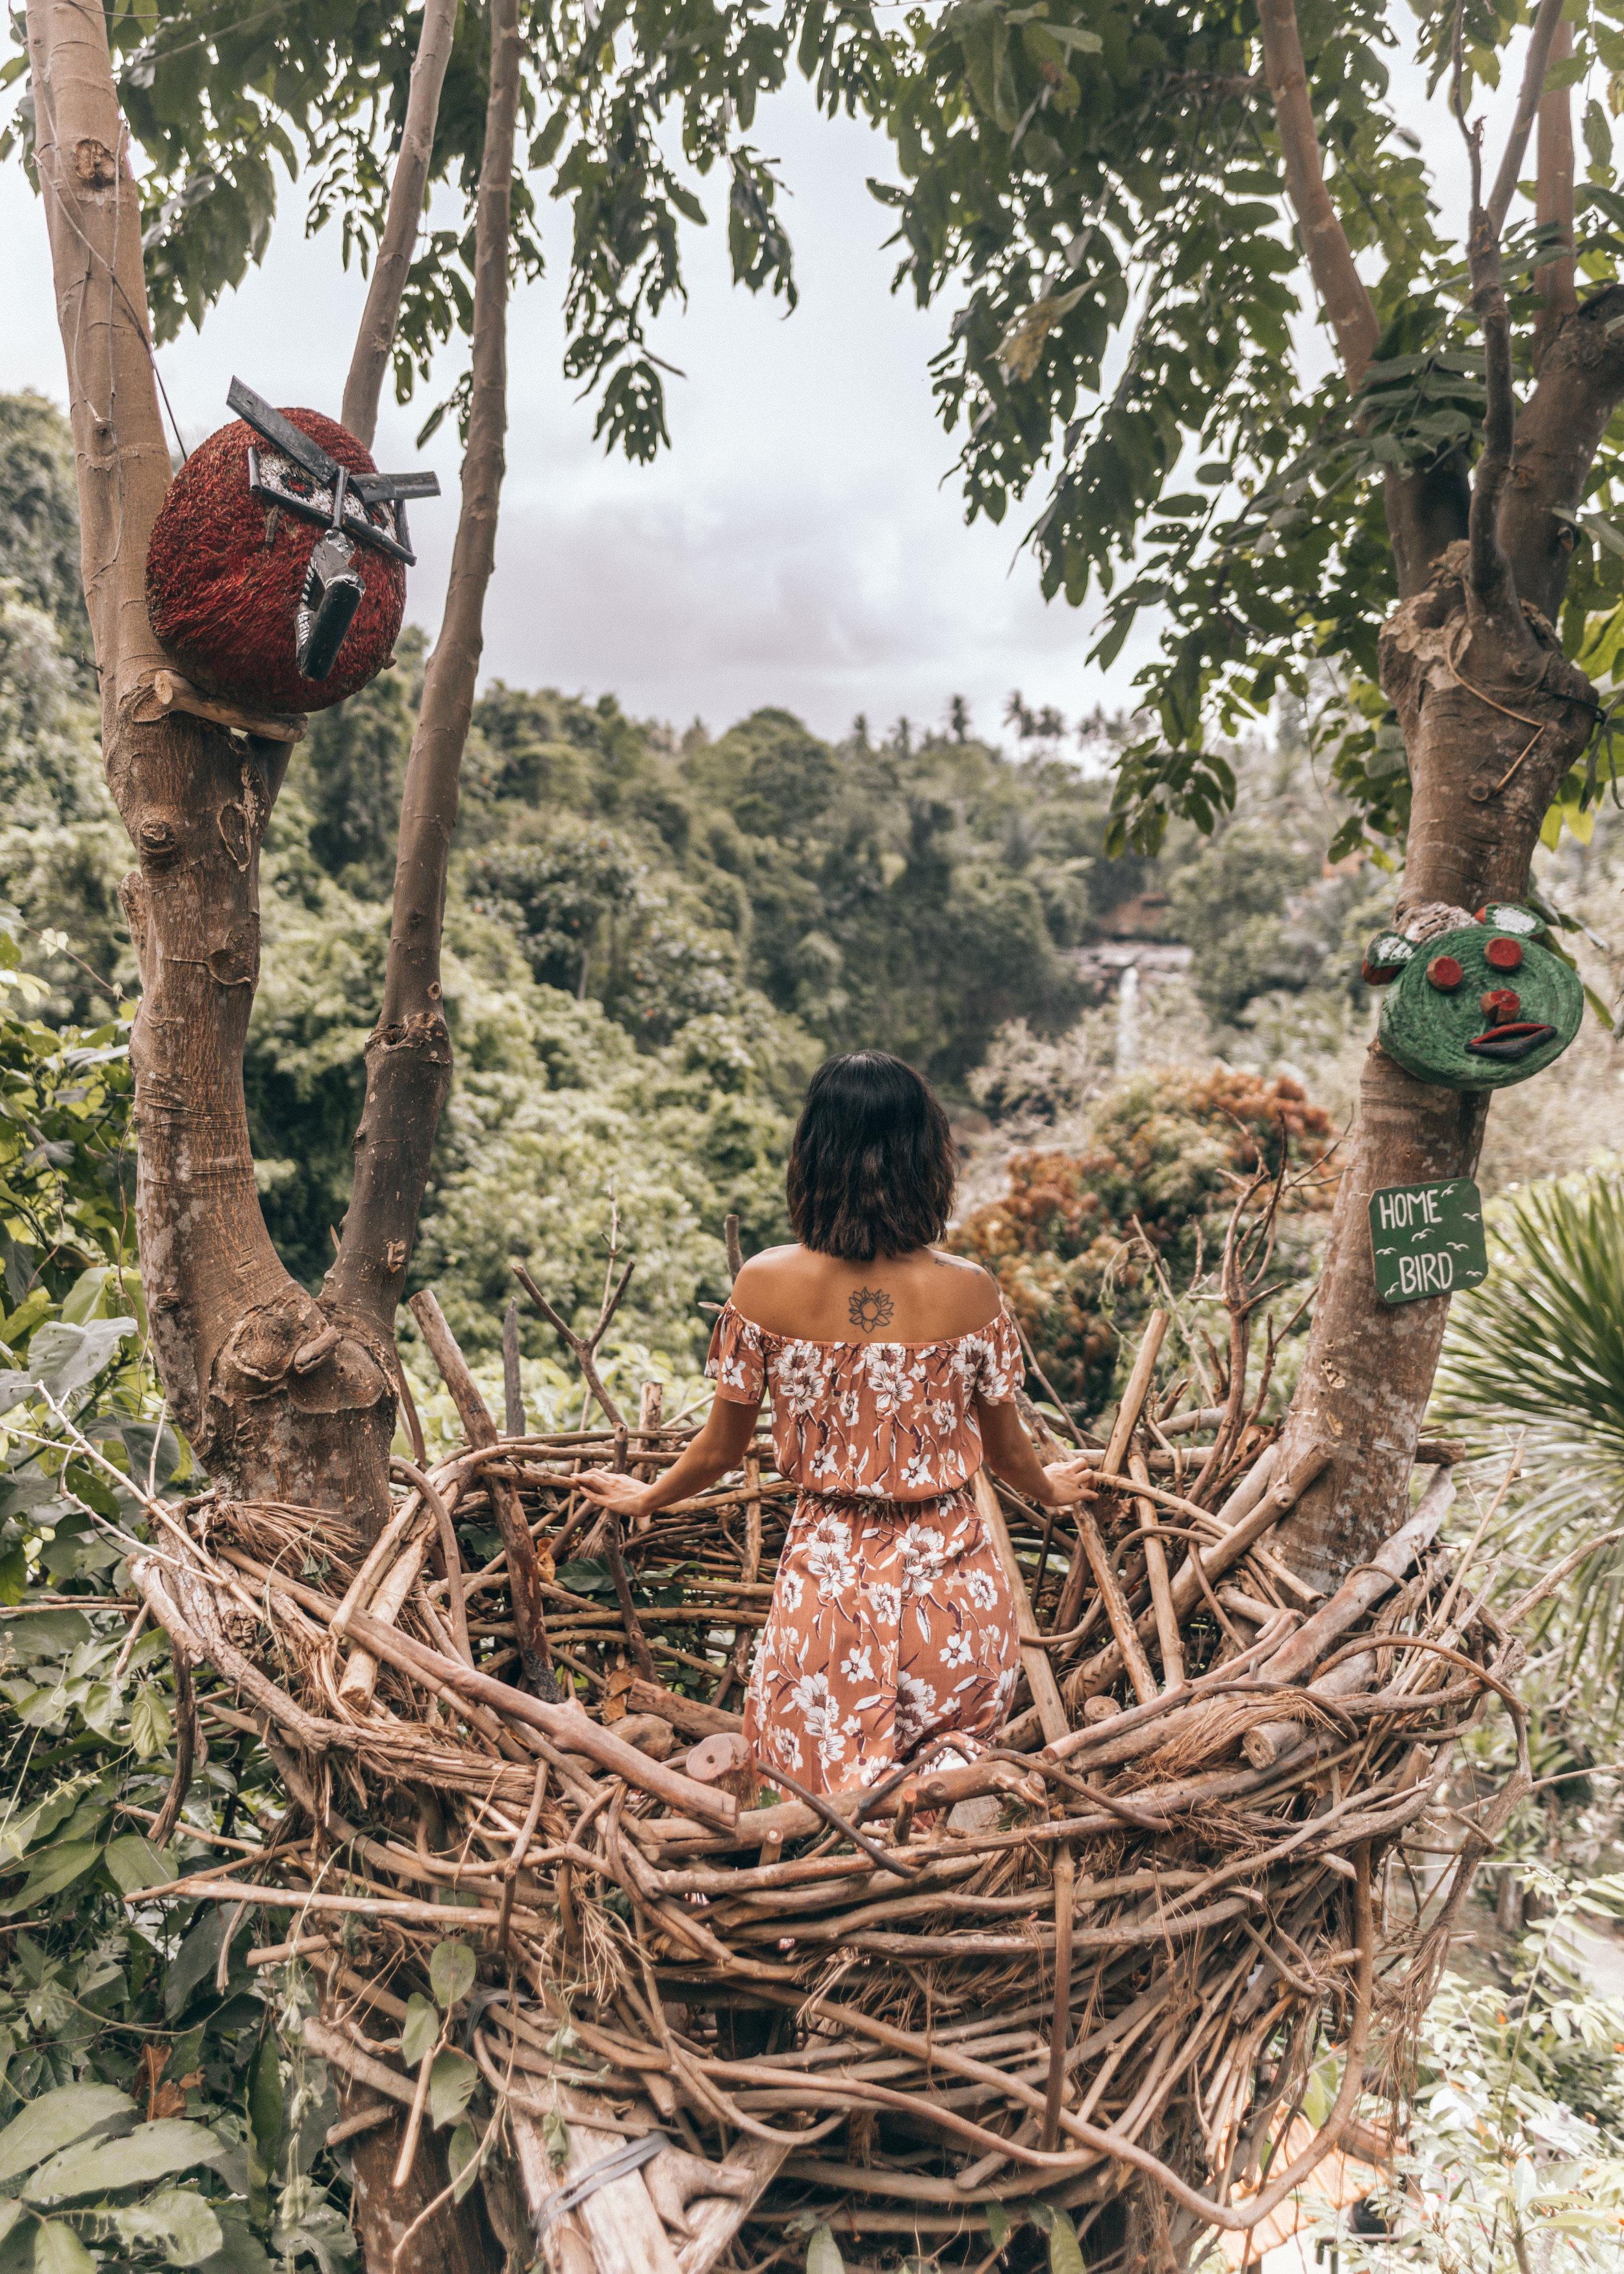 ubud-bali-things-to-do-by-lisa-linh